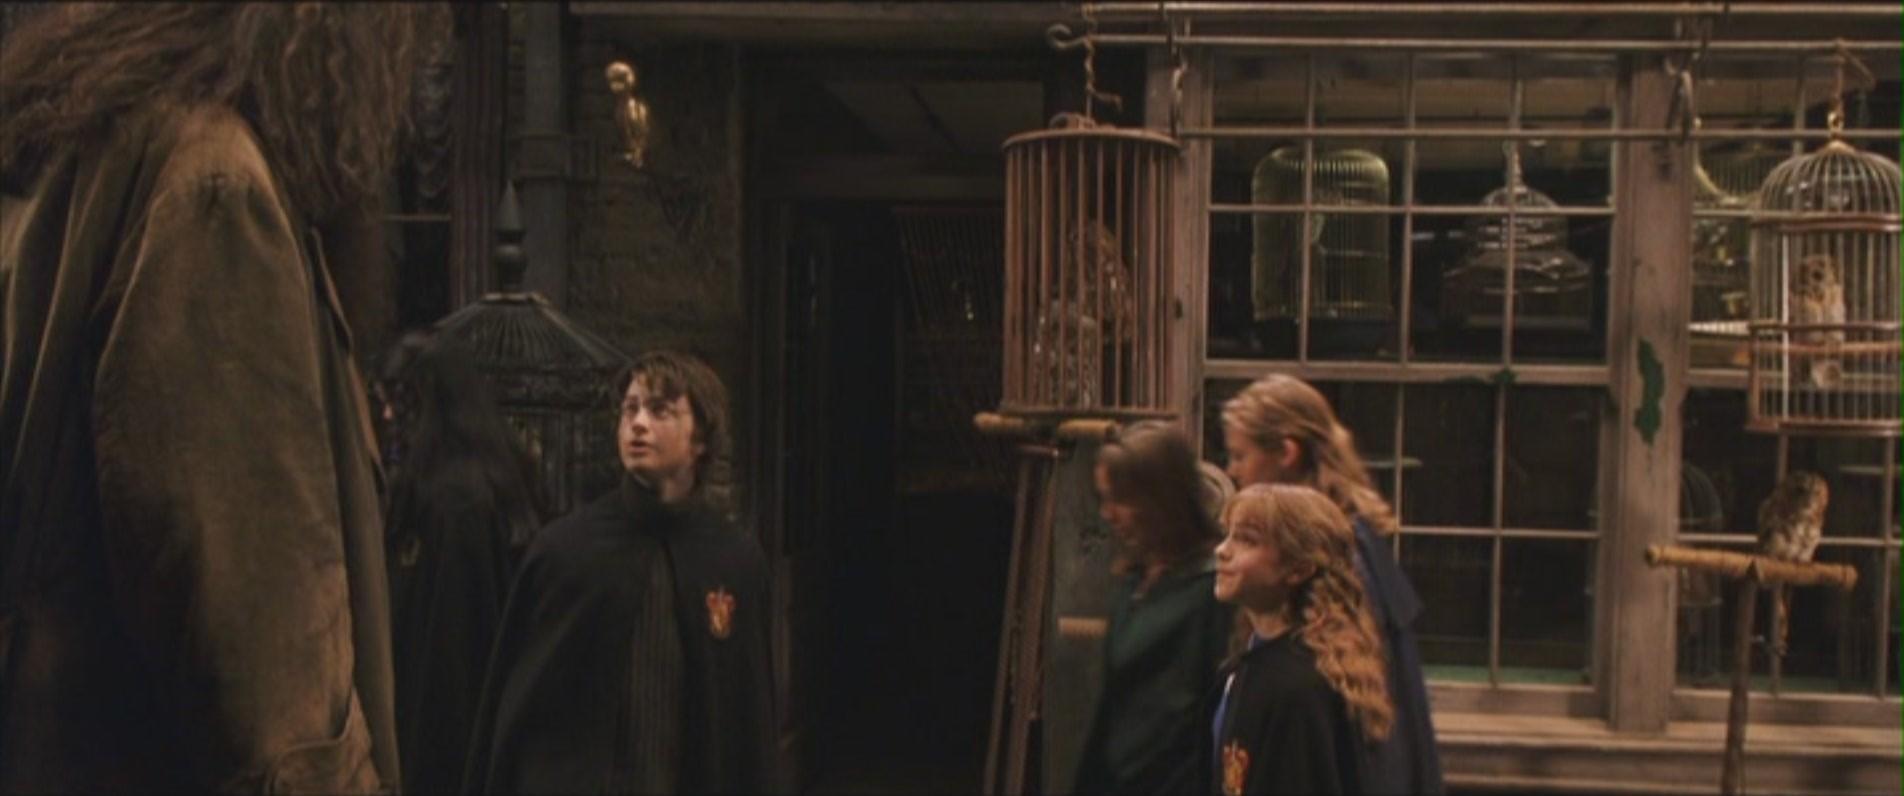 Harry amp hermione secret affair 7